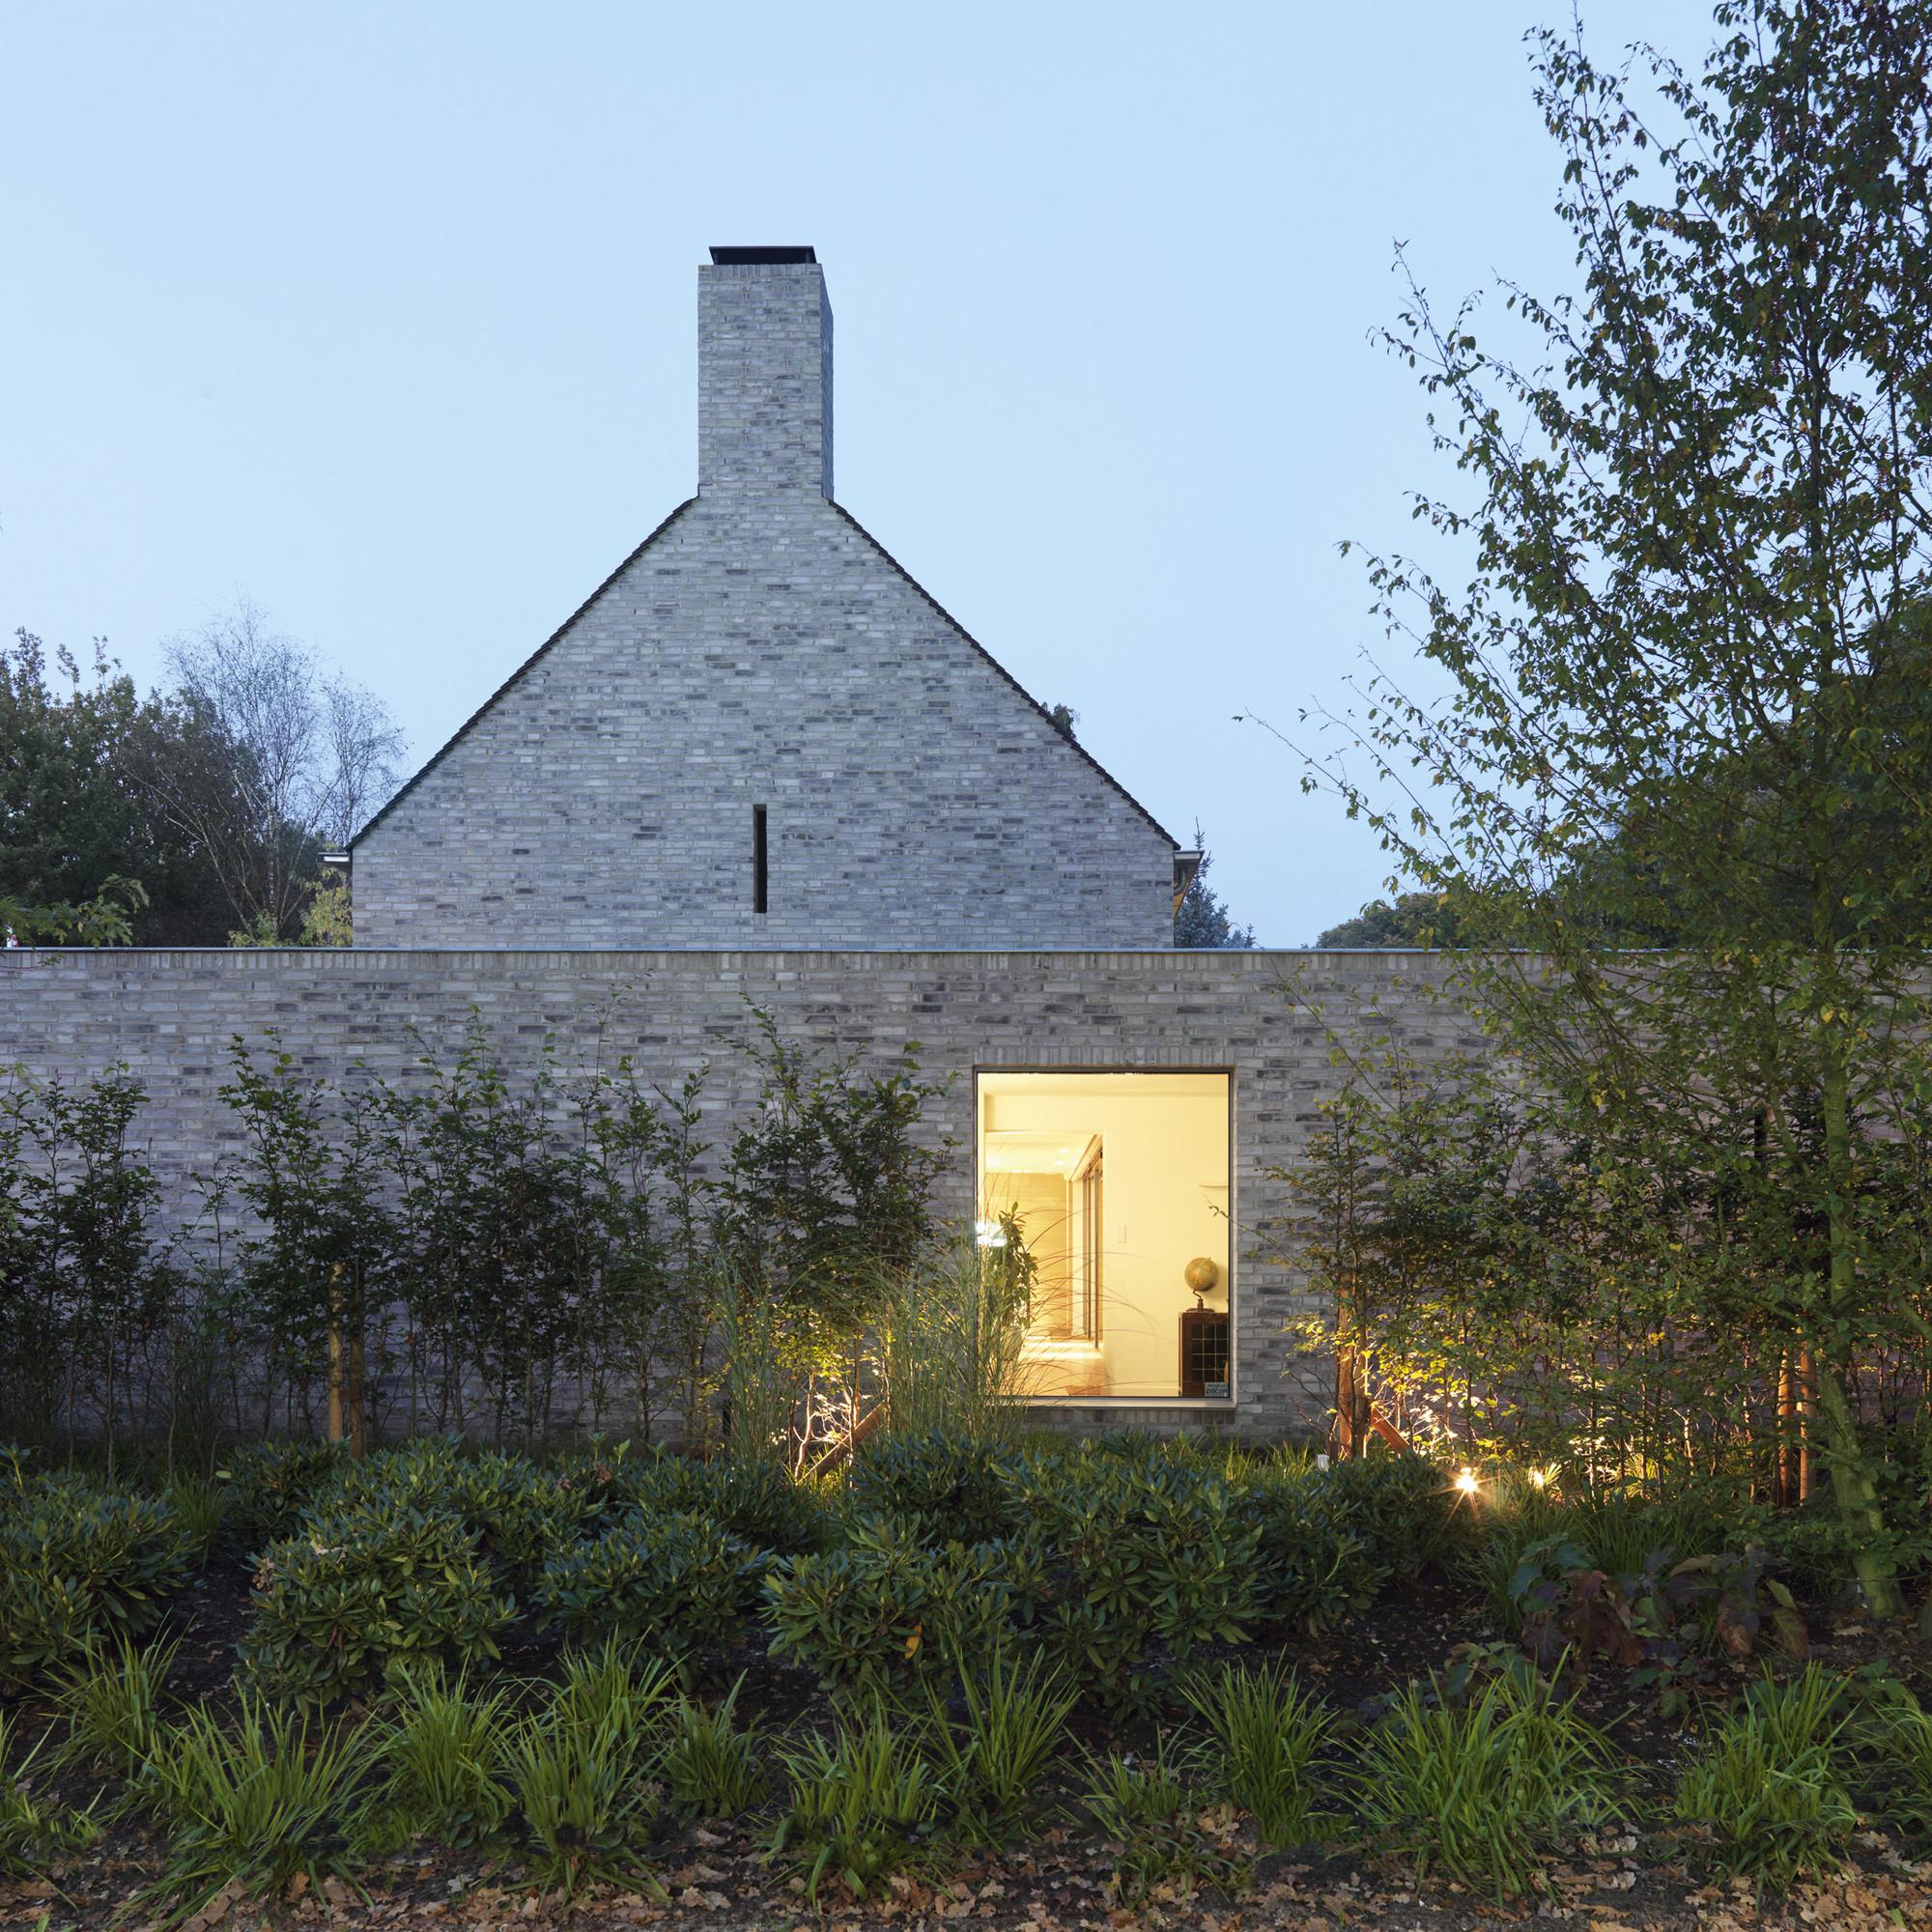 Villa Rotonda / Bedaux de Brouwer Architects, © Michel Kievits